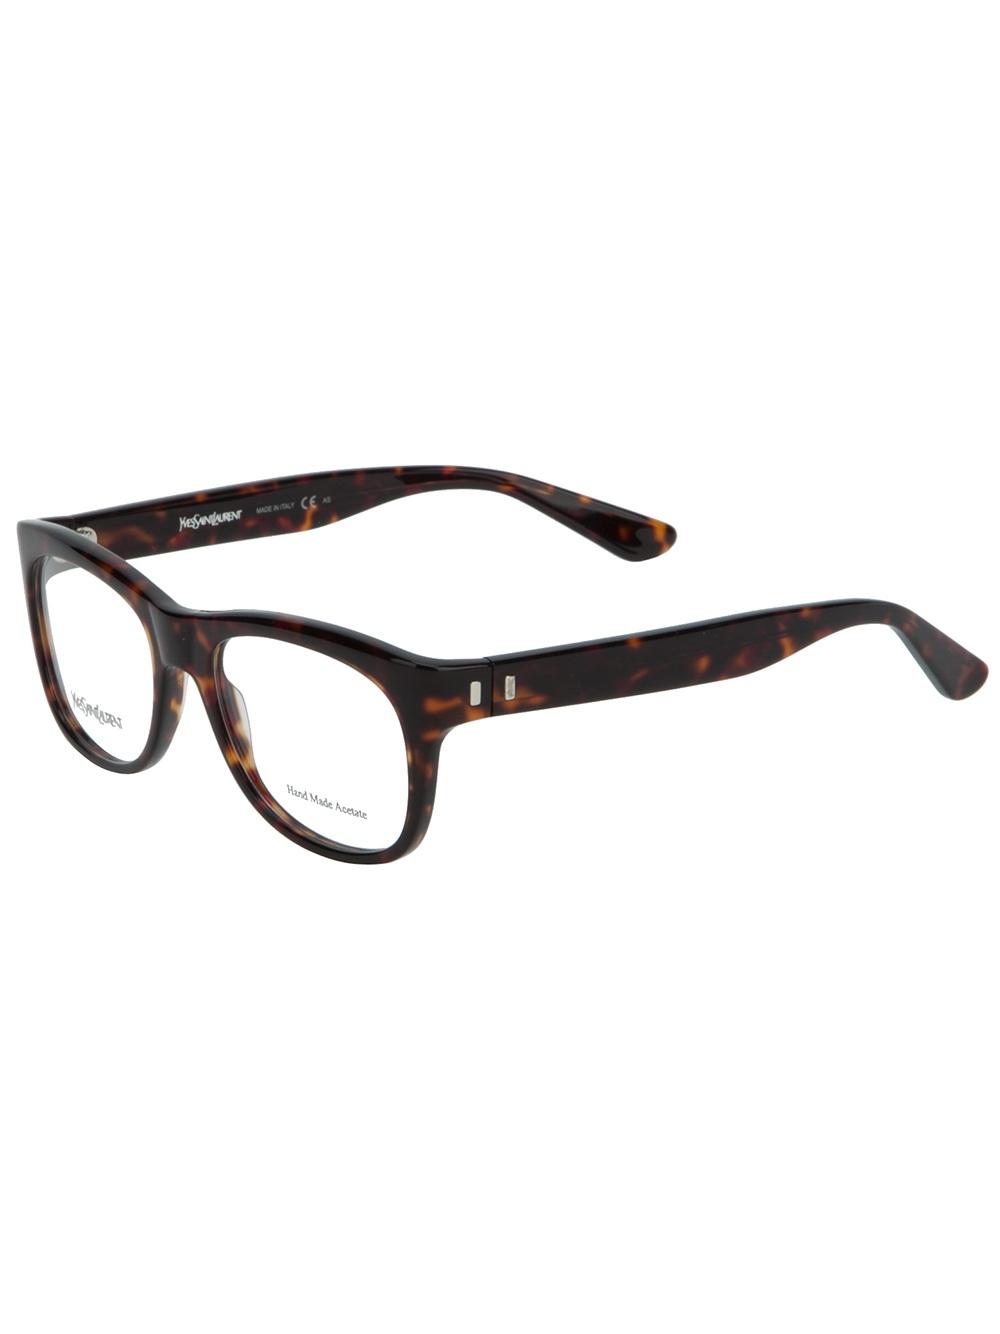 80f690797ca36 Saint Laurent Tortoise Shell Glasses in Brown - Lyst